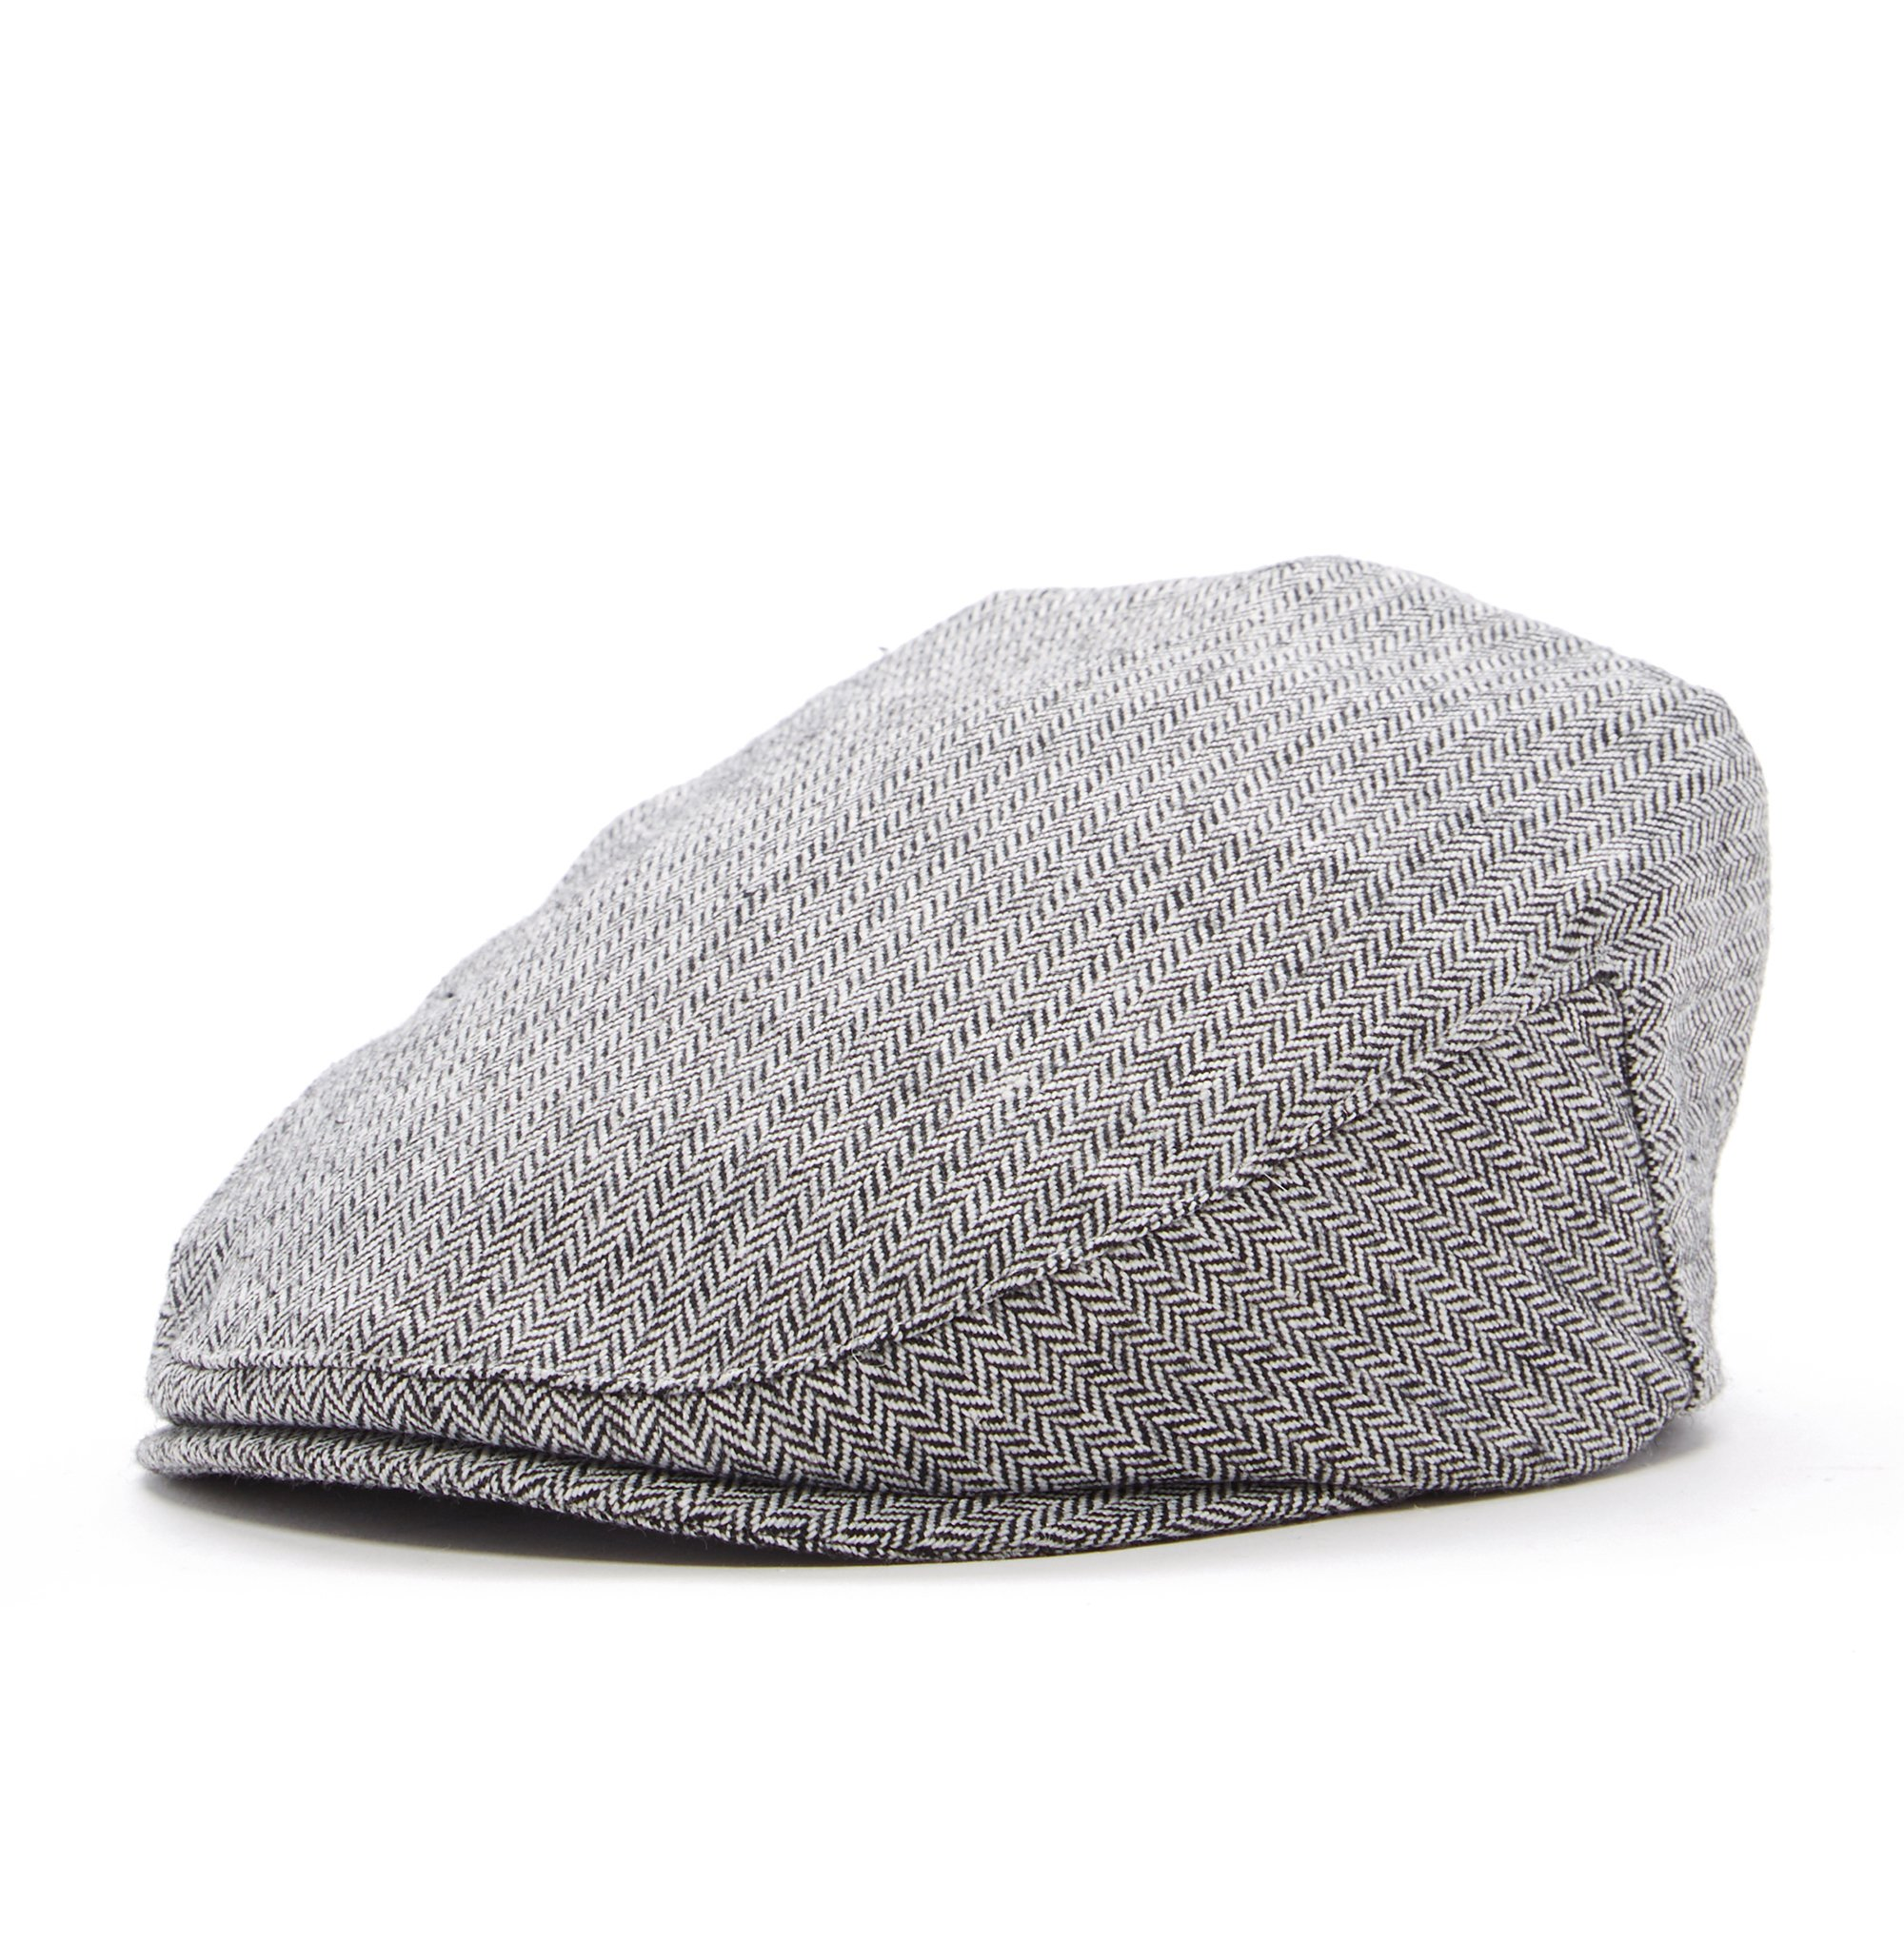 Born to Love - Boy's Tweed Page Boy Newsboy Baby Kids Driver Cap Hat (XXS 46CM), Grey Black